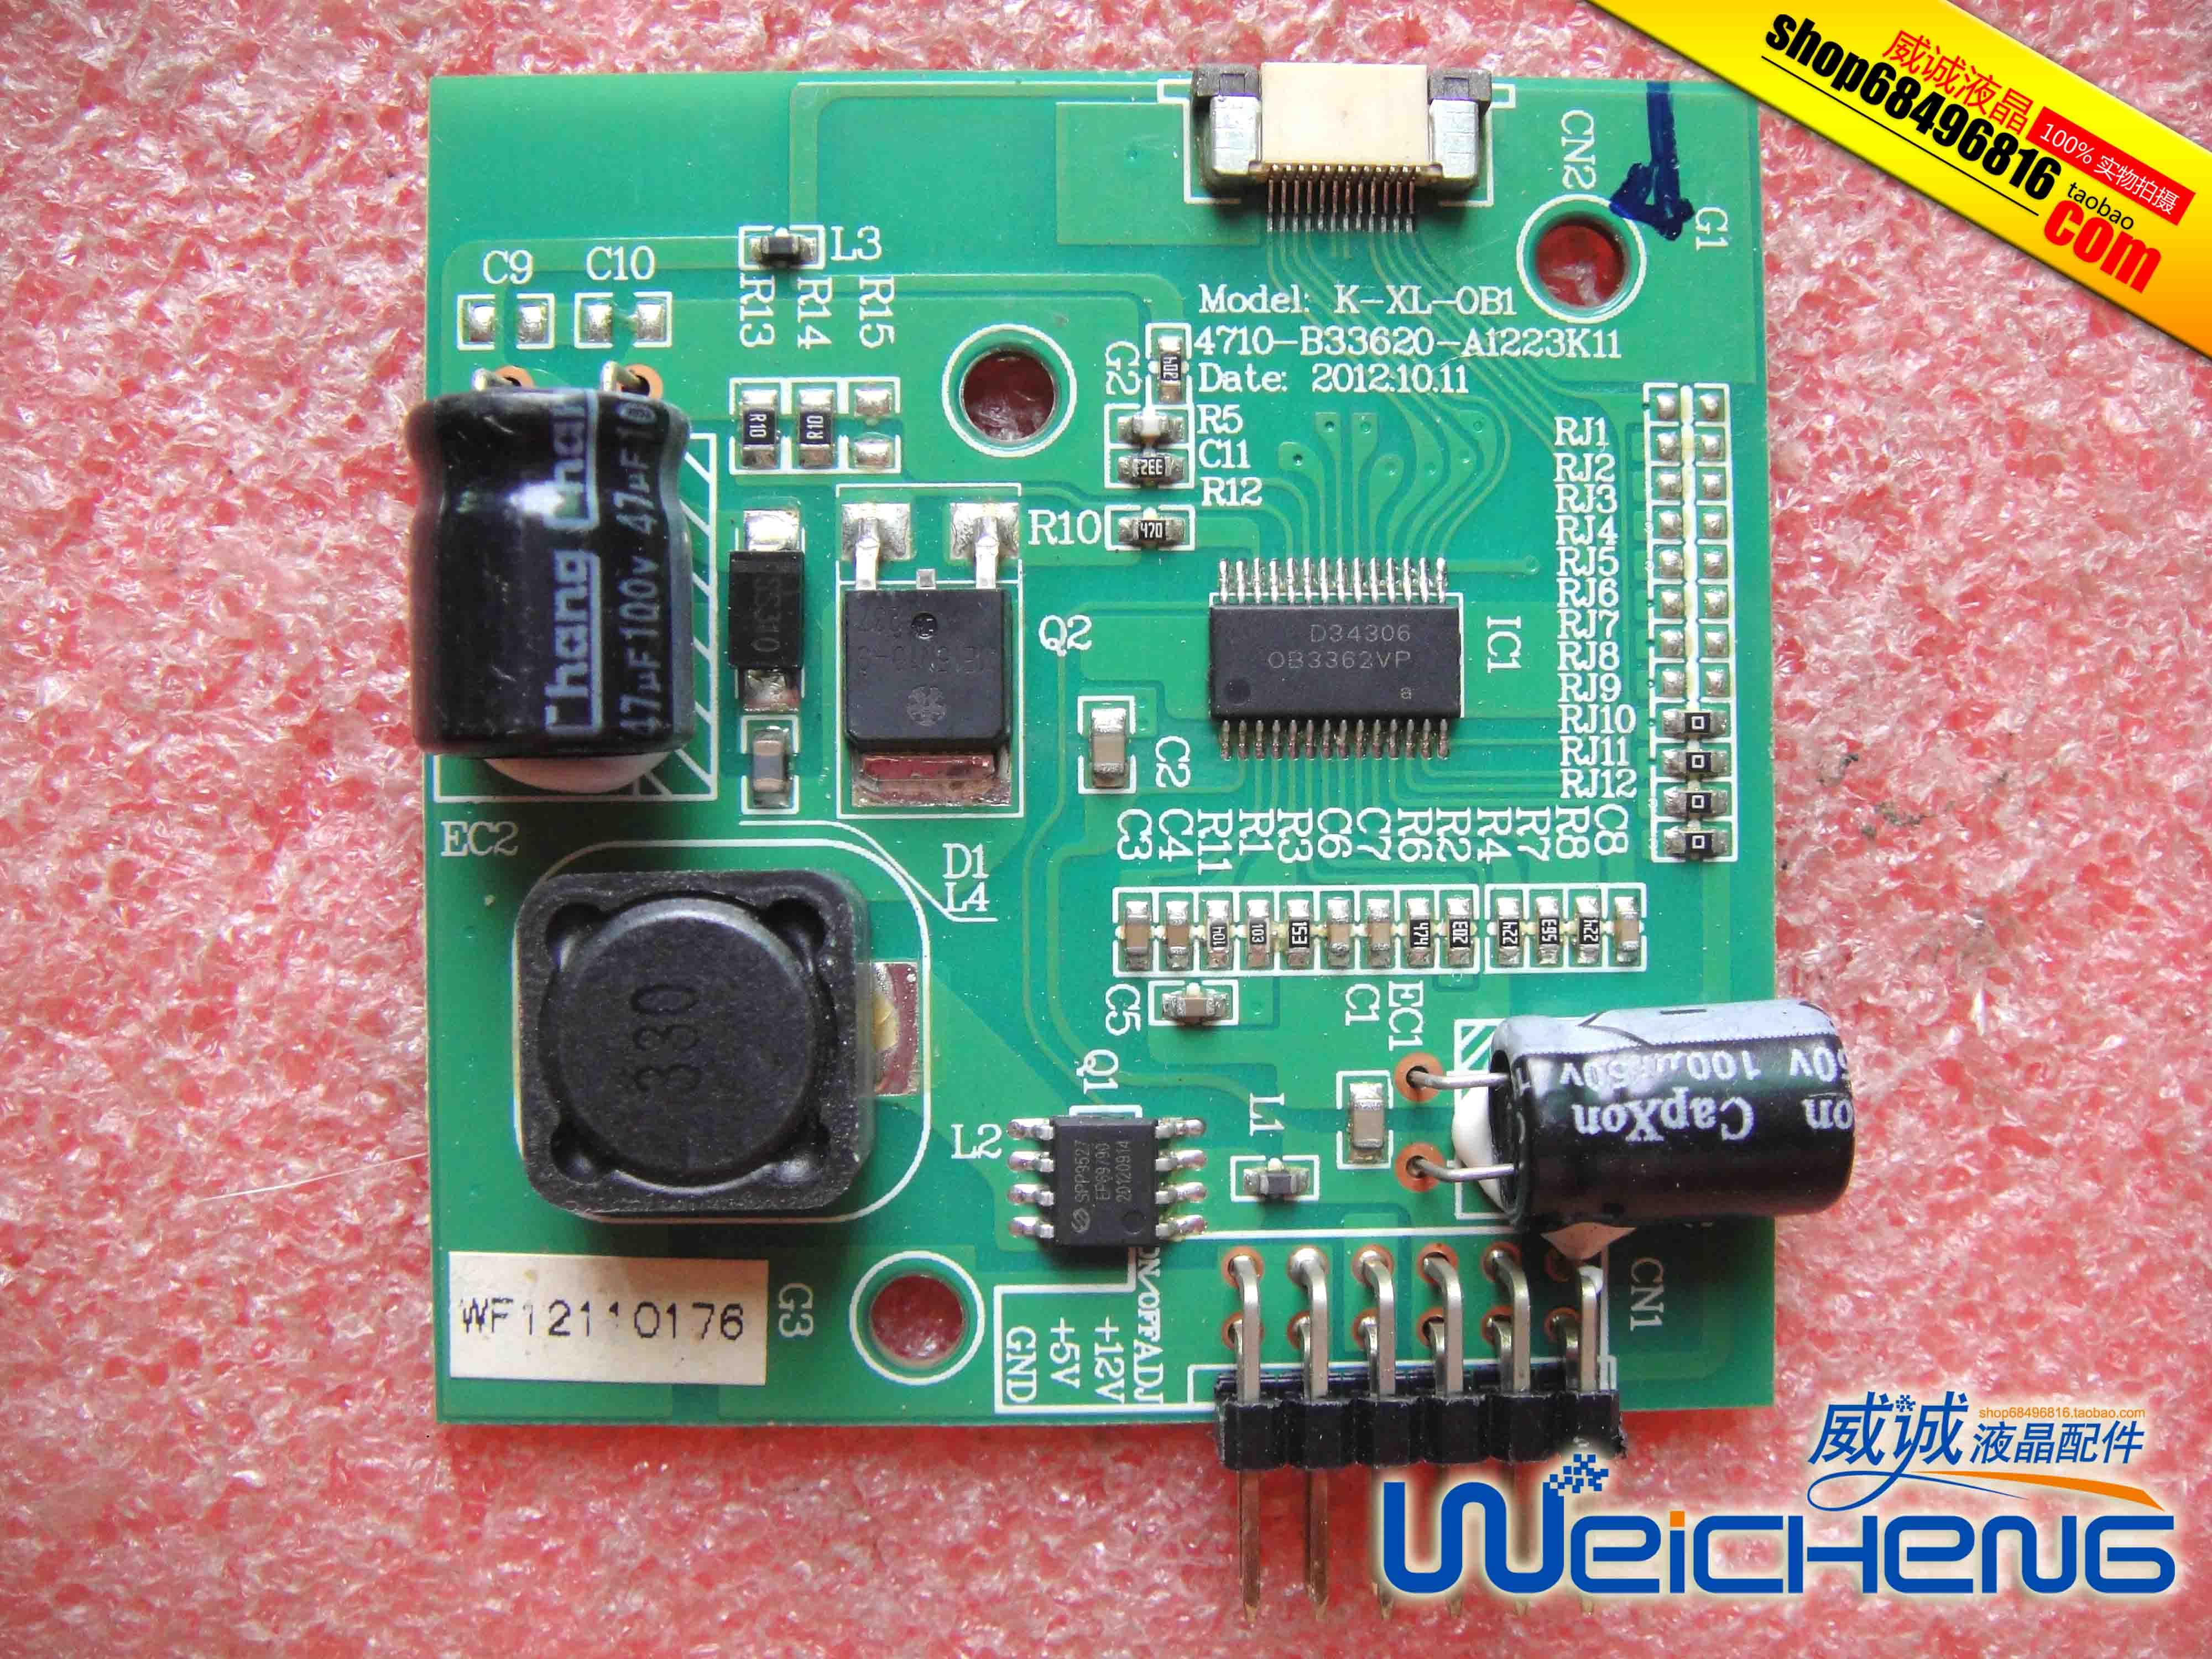 4710-B33620-A1223K11 لوحة الضغط العالي